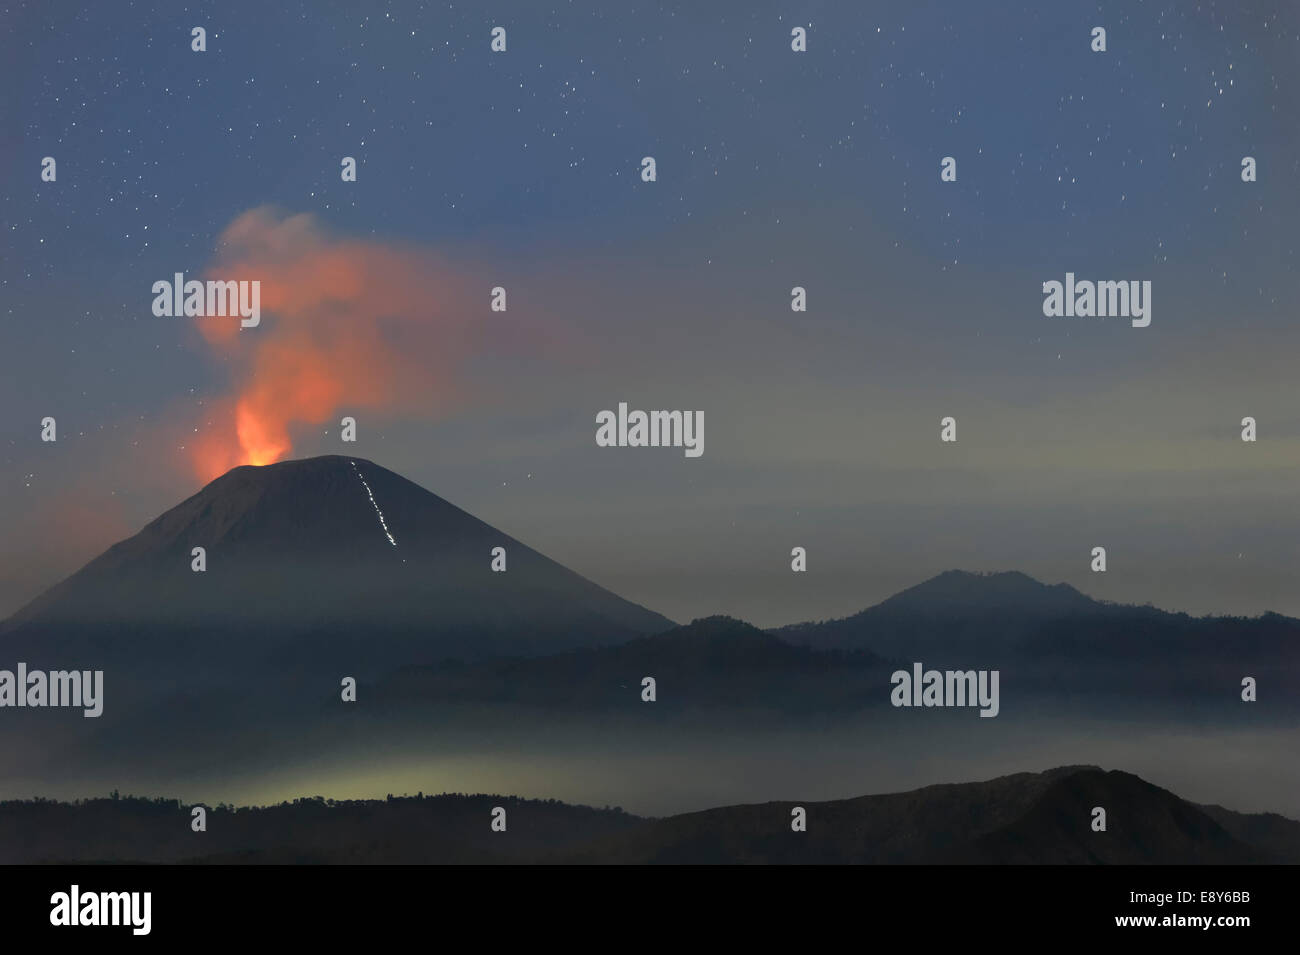 Active Gunung Bromo volcano at night, Bromo-Tengger-Semeru National Park, Java, Indonesia, Asia - Stock Image